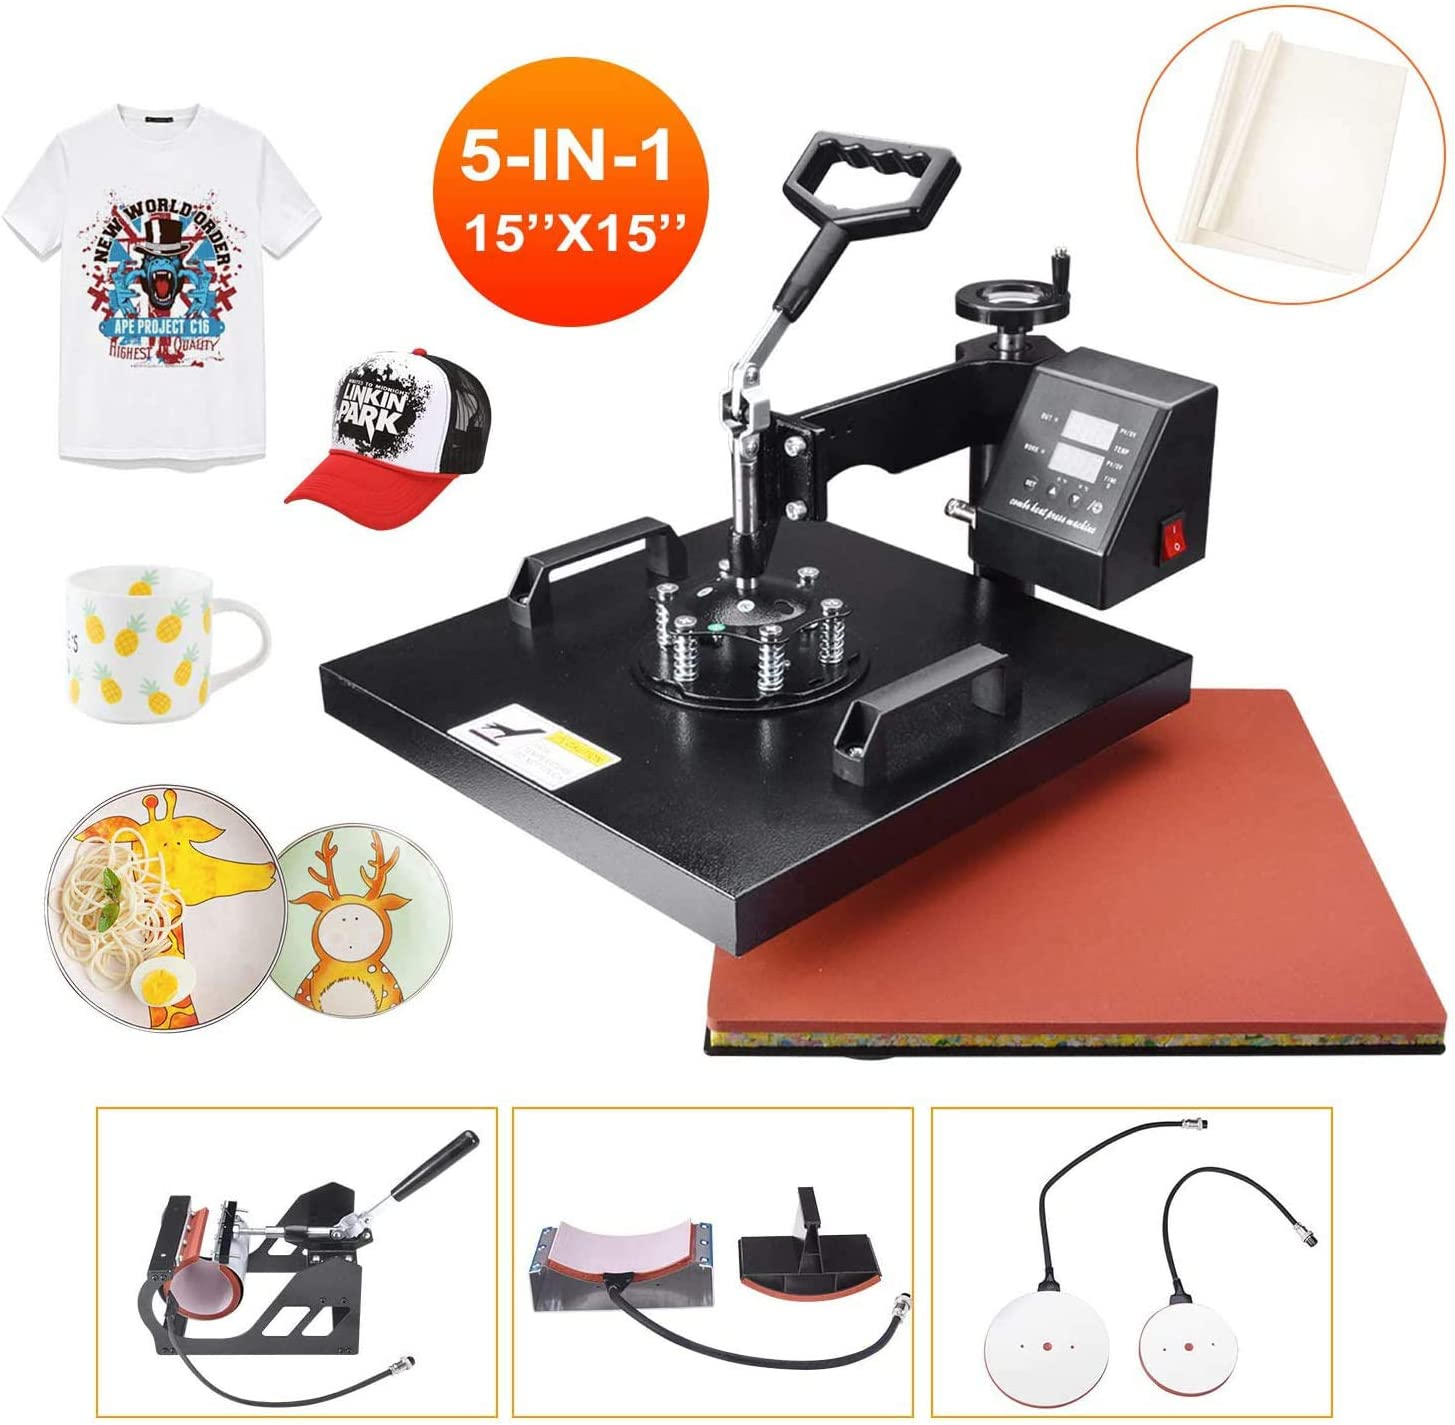 Seeutek Heat Press 15x15 inch Heat Press 5 in 1 Machine 360-Degree Swing Away Digital Multifunction Sublimation Combo for T Shirts Mugs Hat Plate Cap